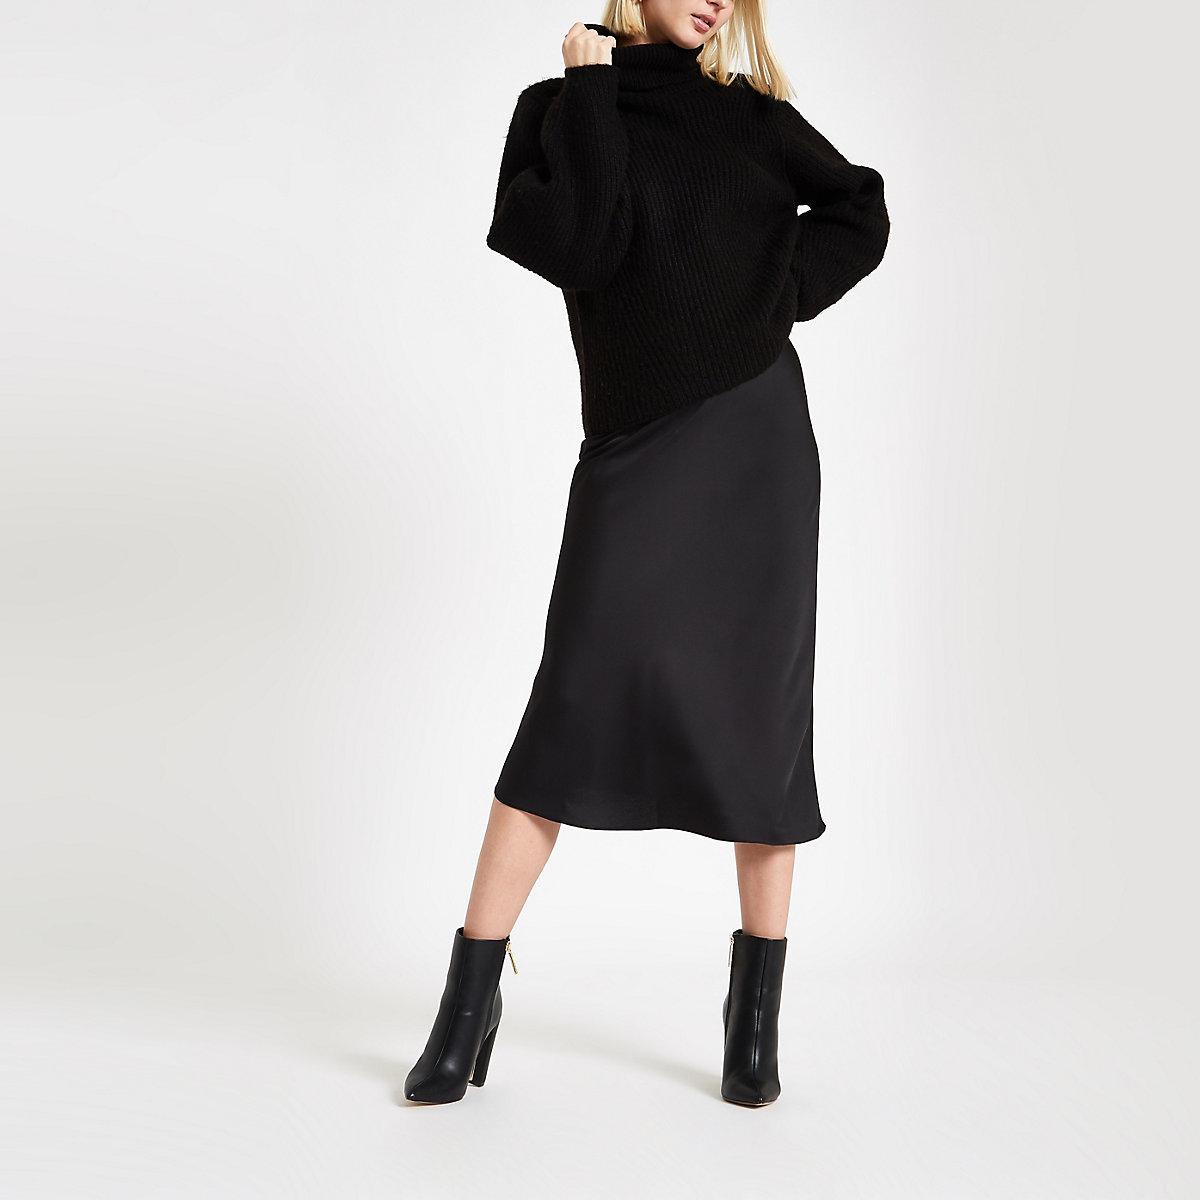 Black bias cut midi skirt